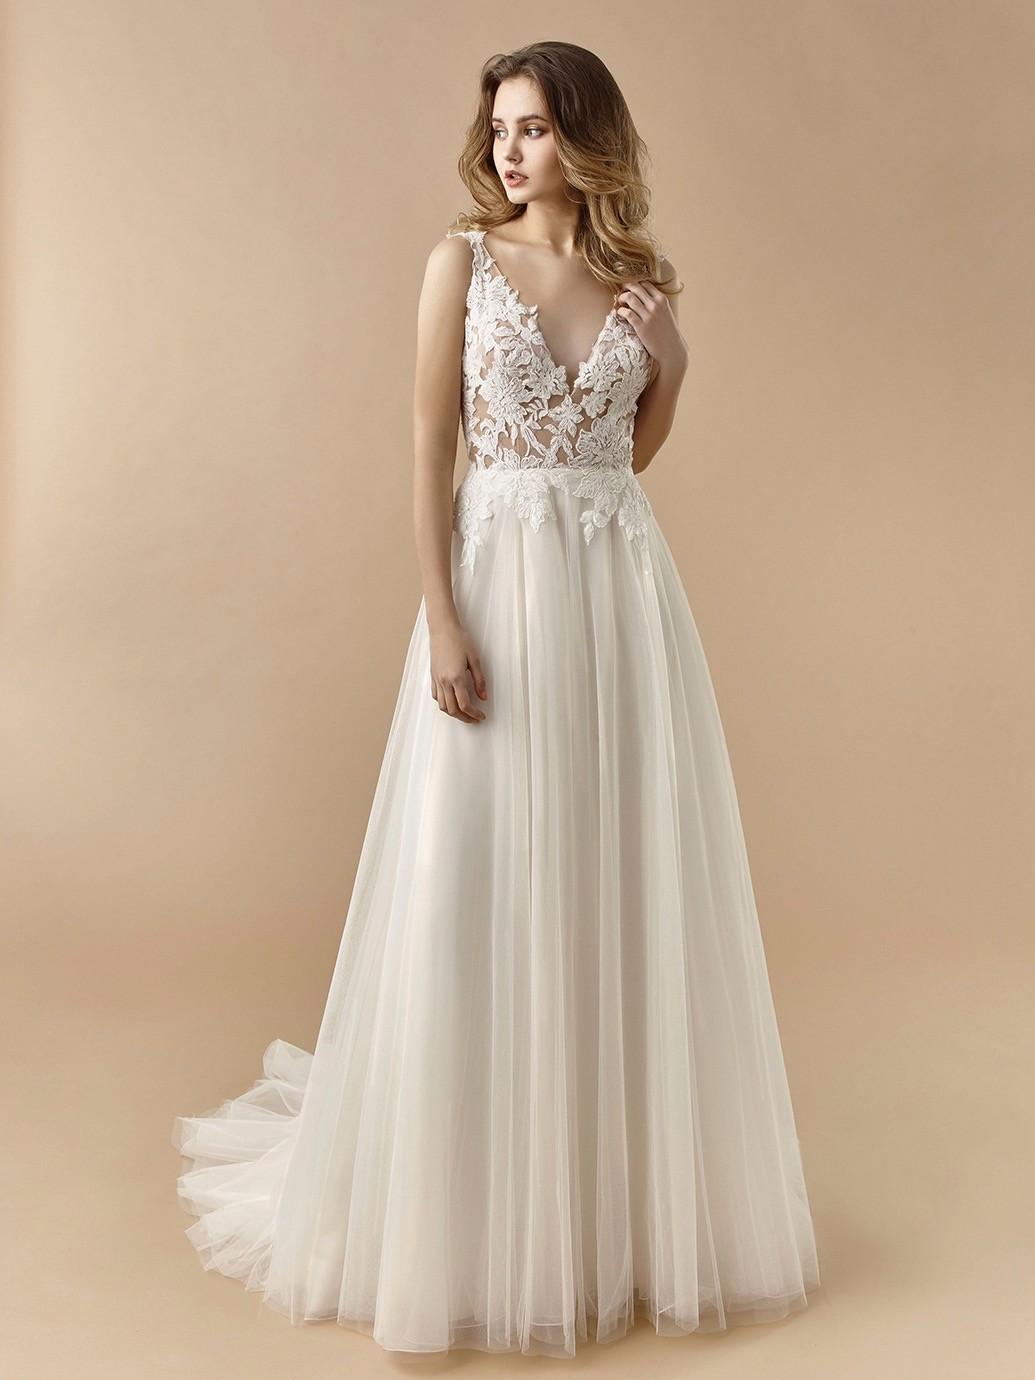 Brautkleid in A-Linie mit Tüllrock, transparentem ...